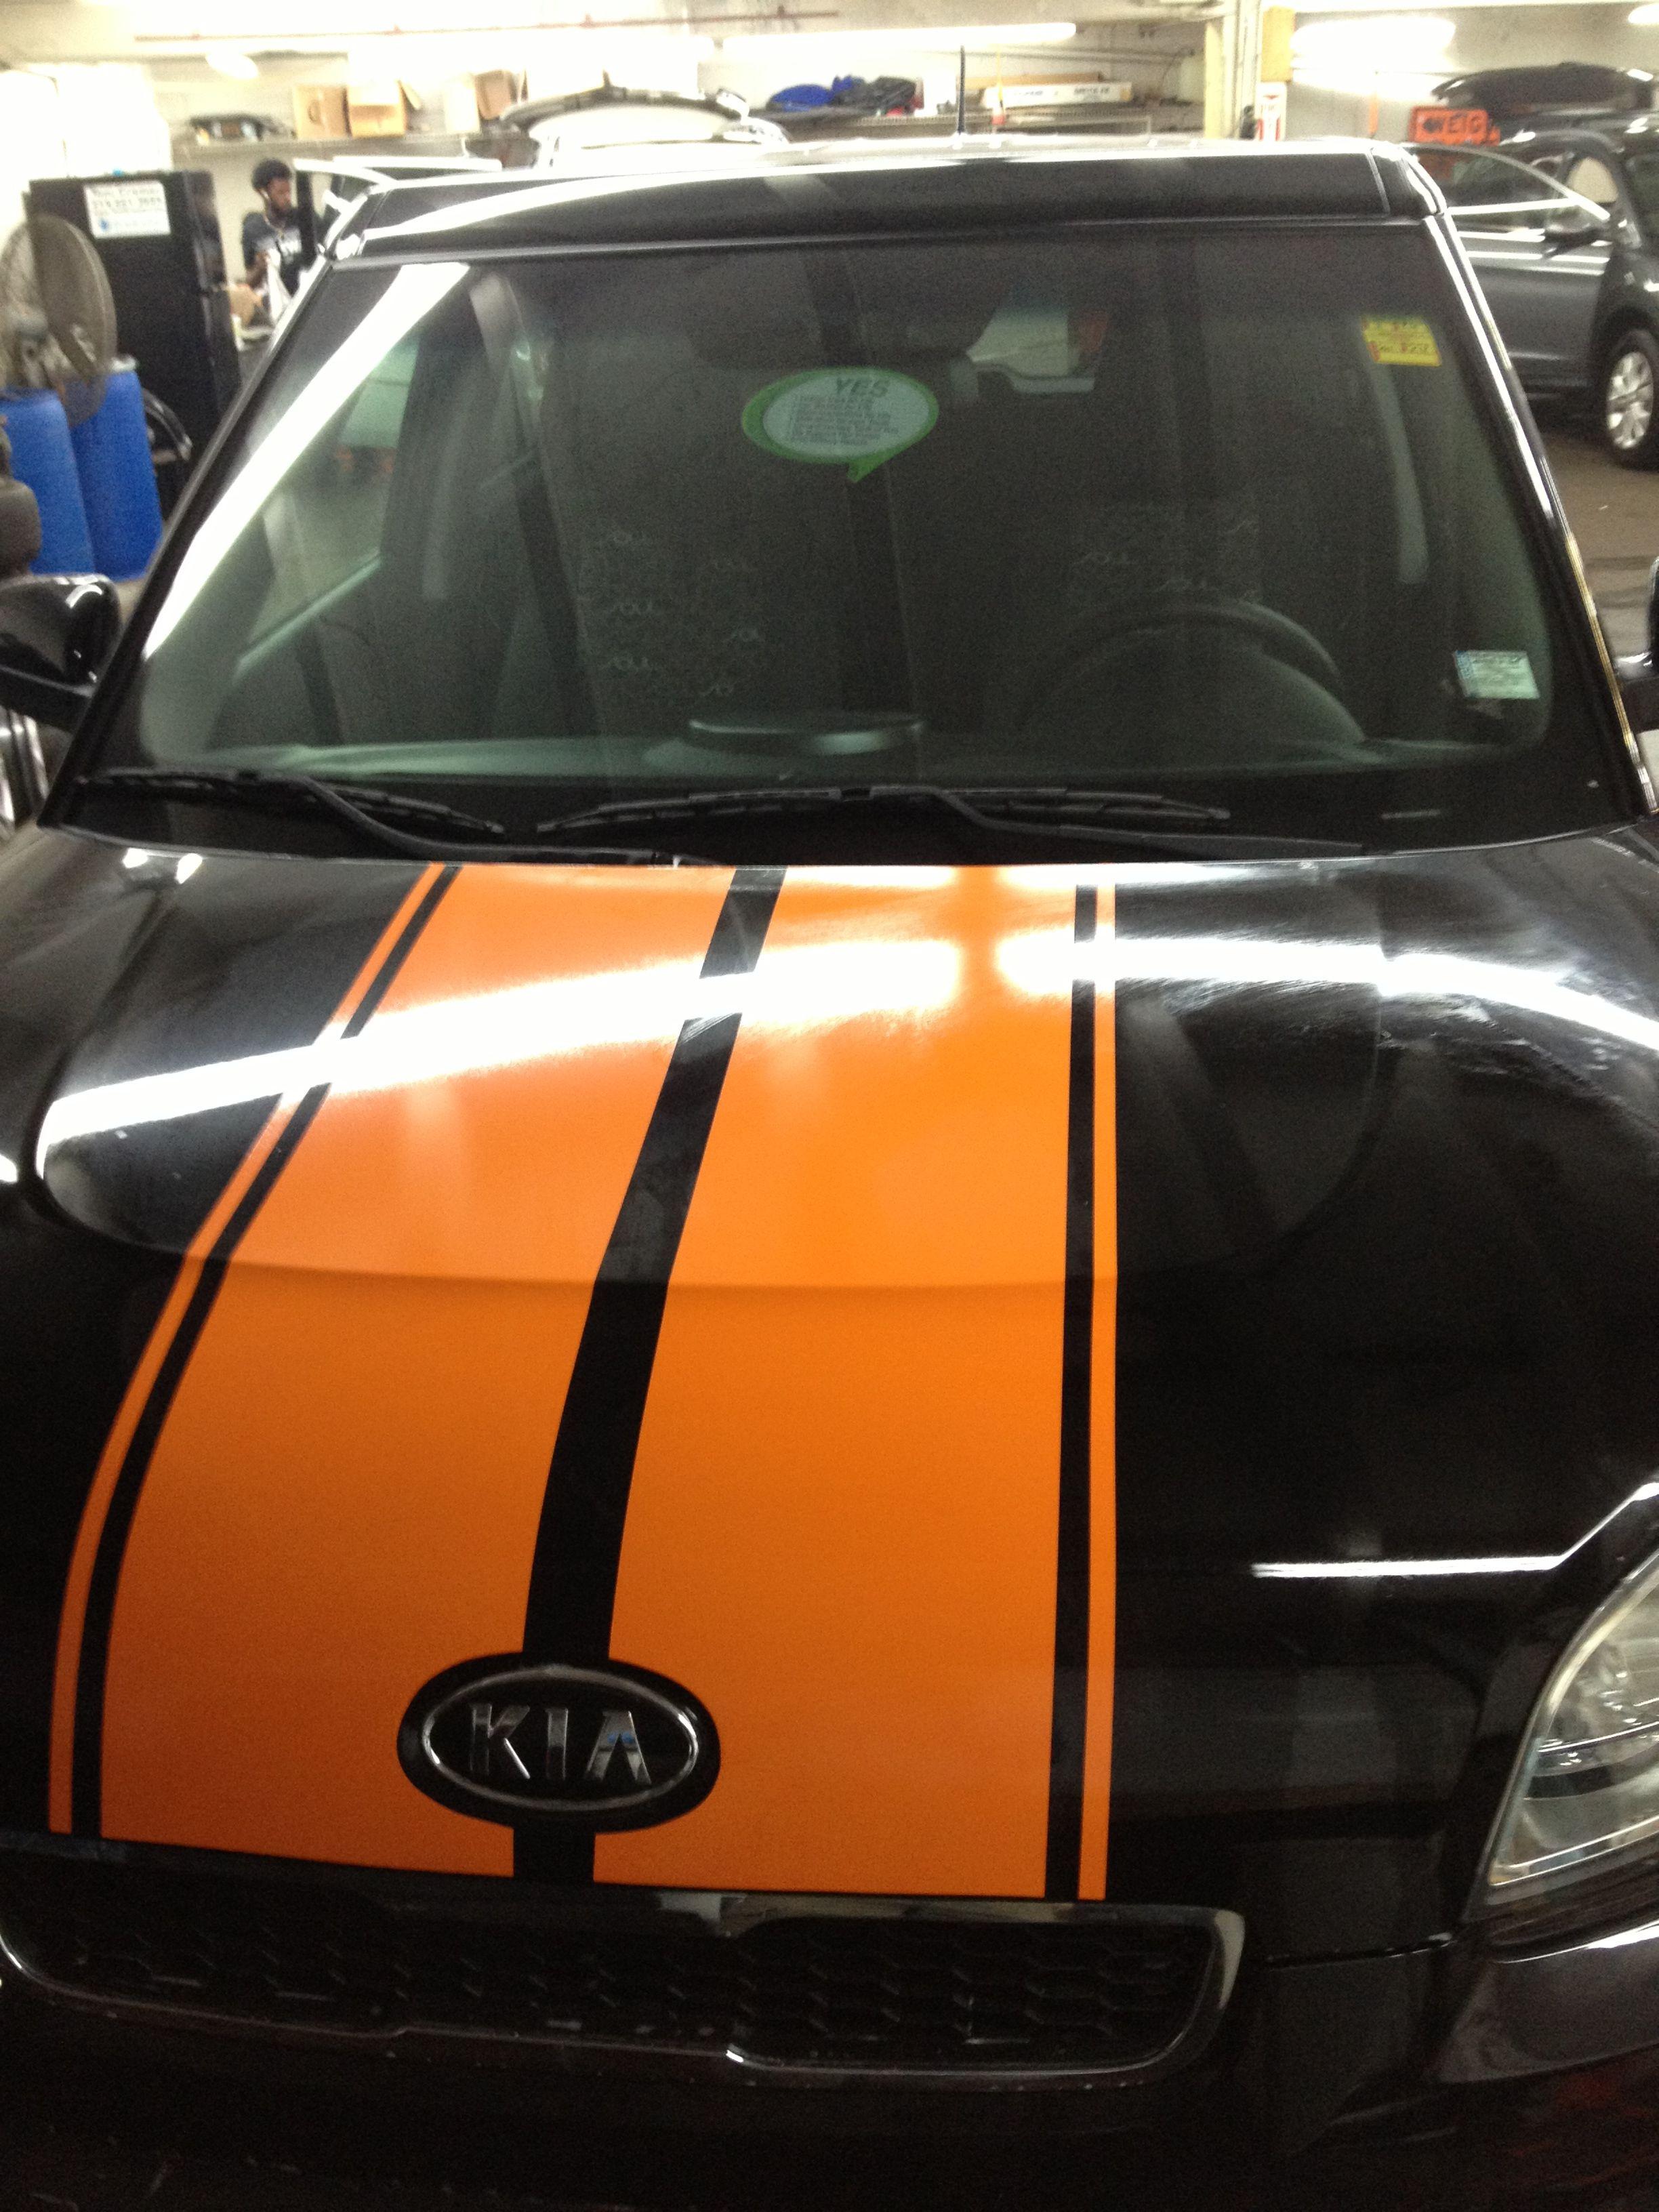 kia blog in debuts ga stinger at auto chicago debut savannah show dealerships df